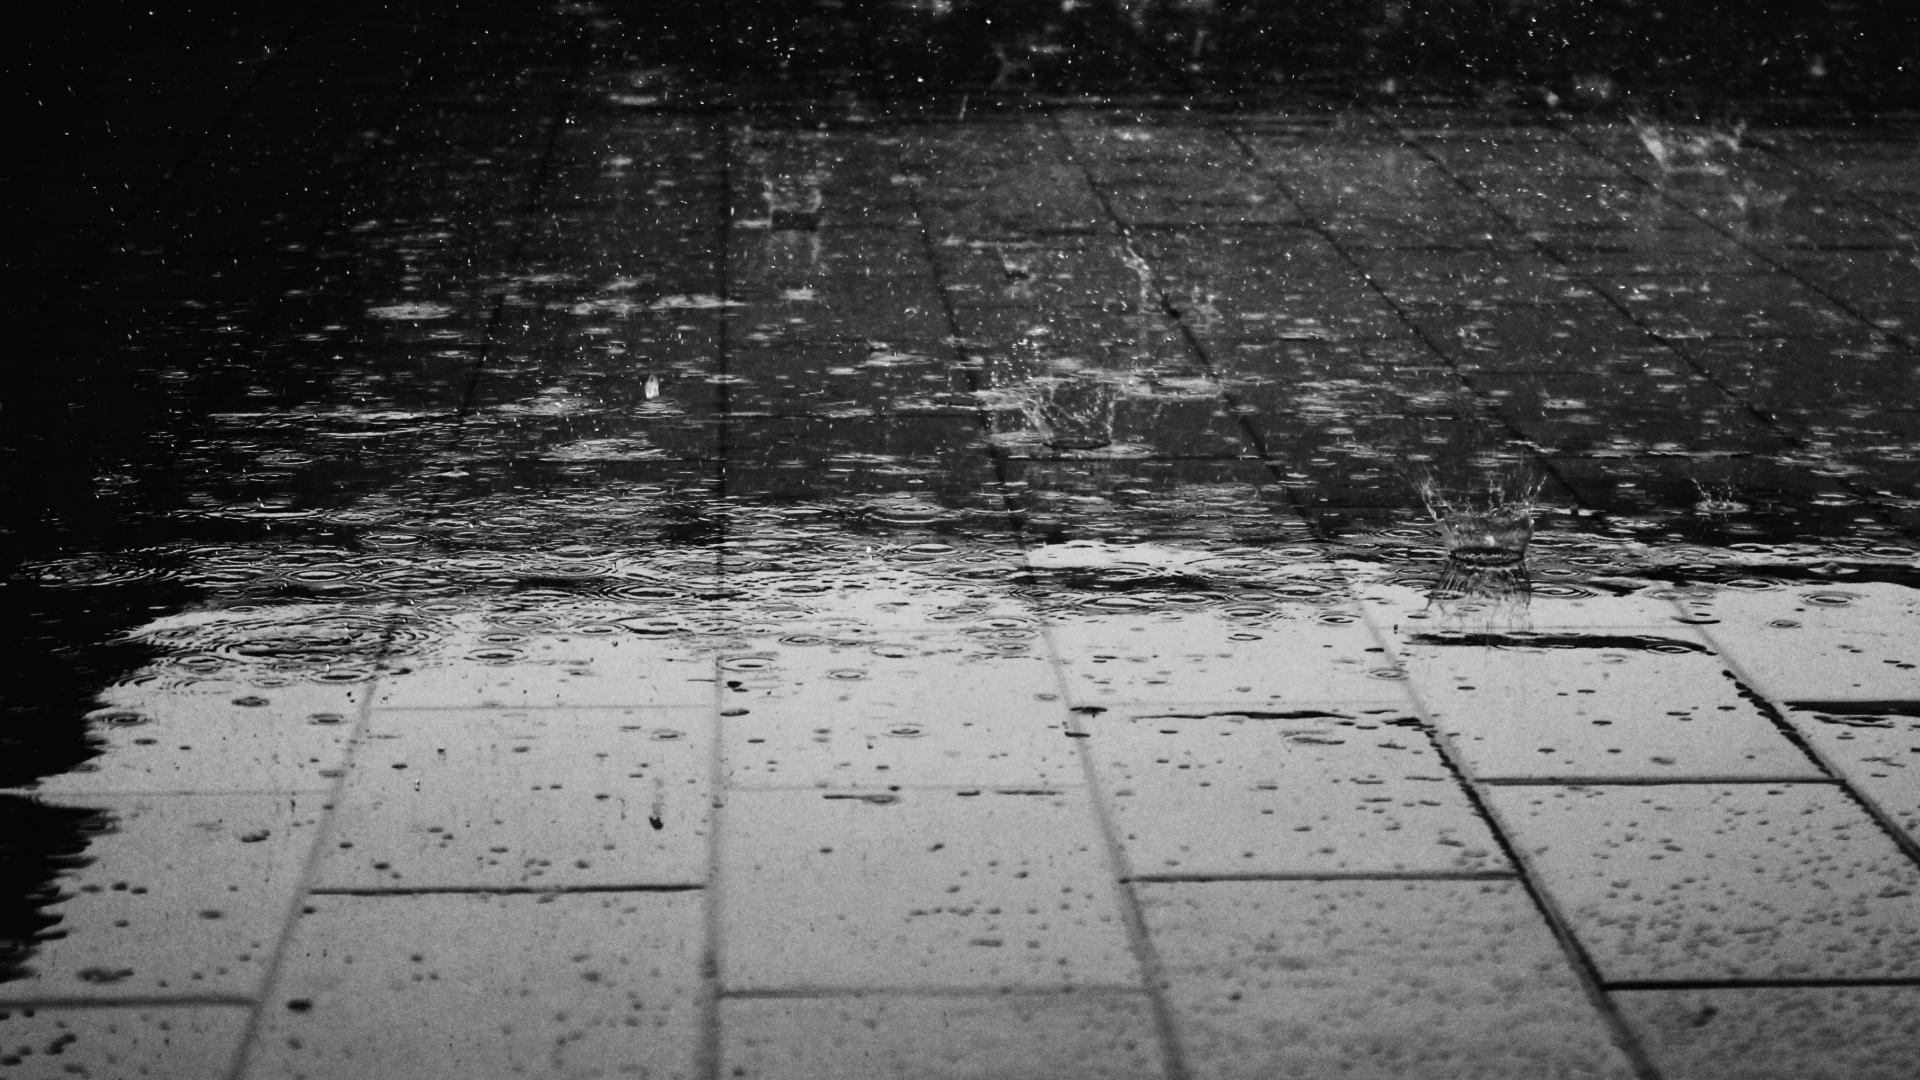 Rain on a pavement